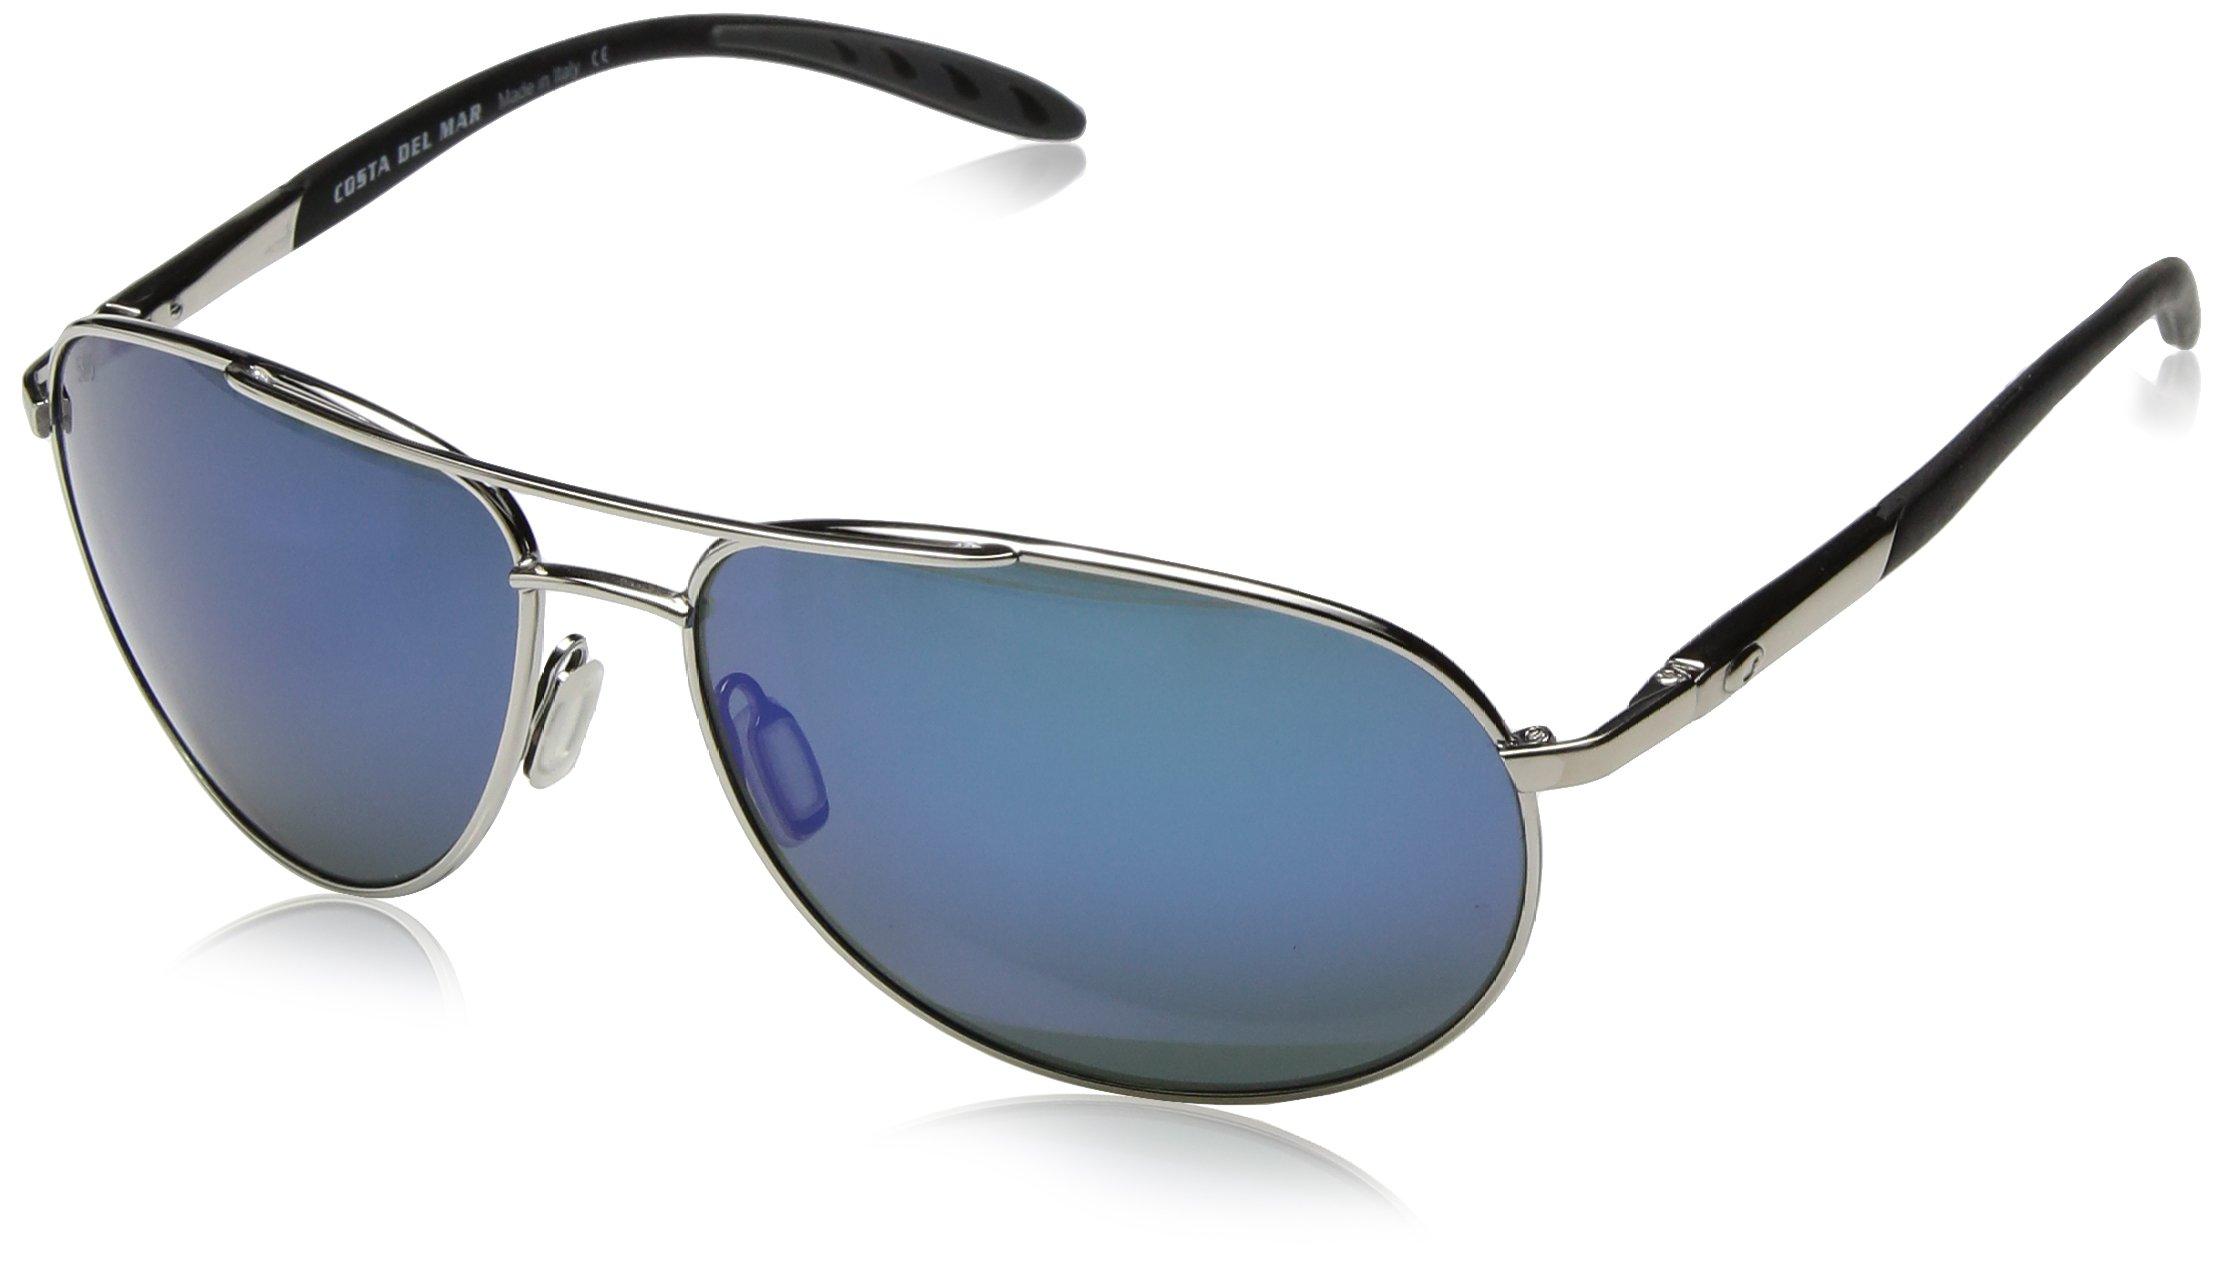 Costa del Mar Men's Wingman Polarized Iridium Aviator Sunglasses, Palladium Silver Frame Blue Mirror Glass - W580, 60.6 mm by Costa del Mar